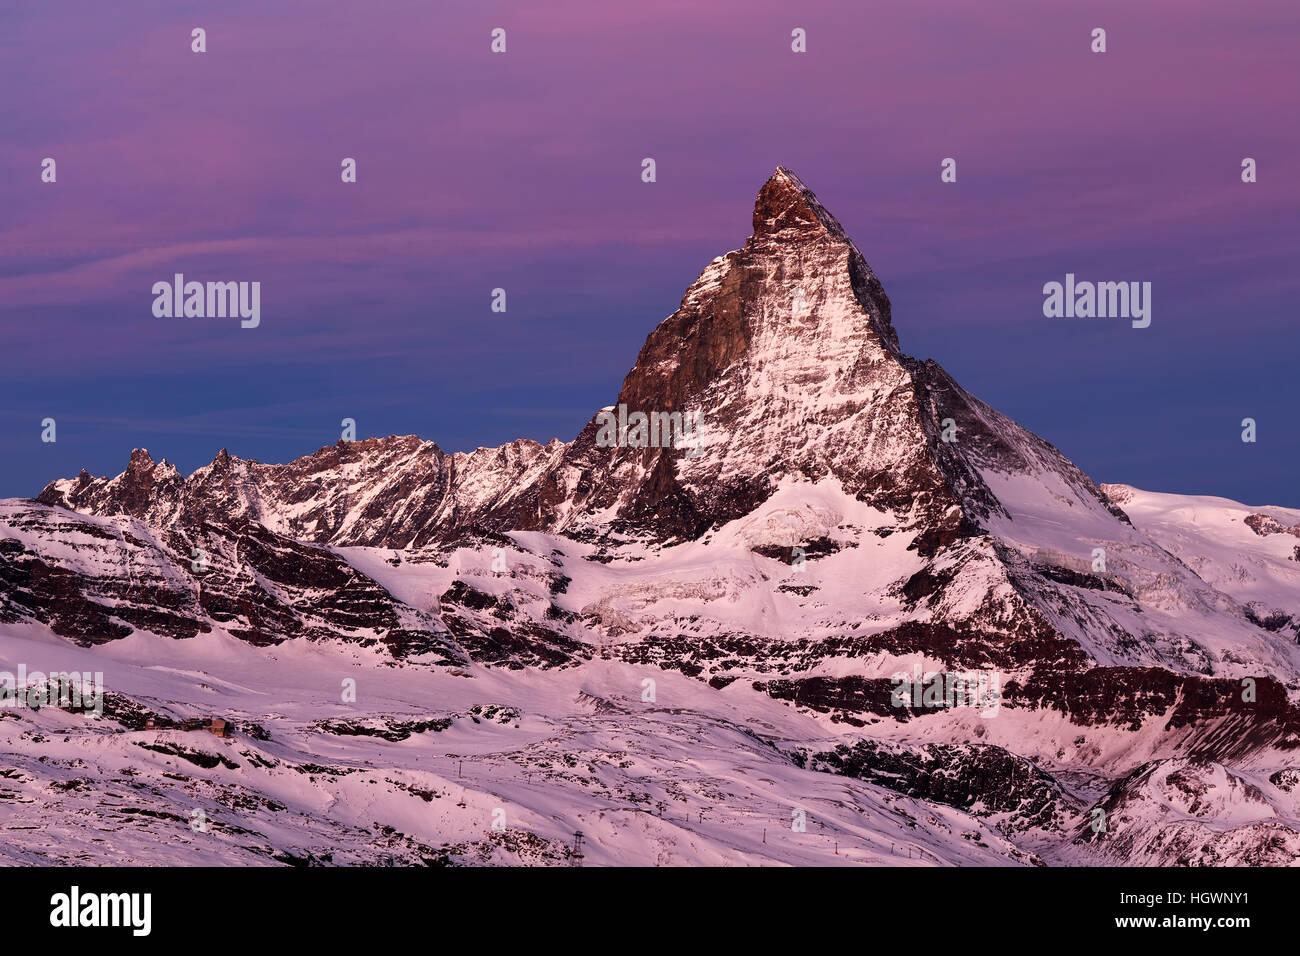 Matterhorn, en horas de la madrugada, los Alpes de Valais, Zermatt, cantón de Valais, Suiza Imagen De Stock